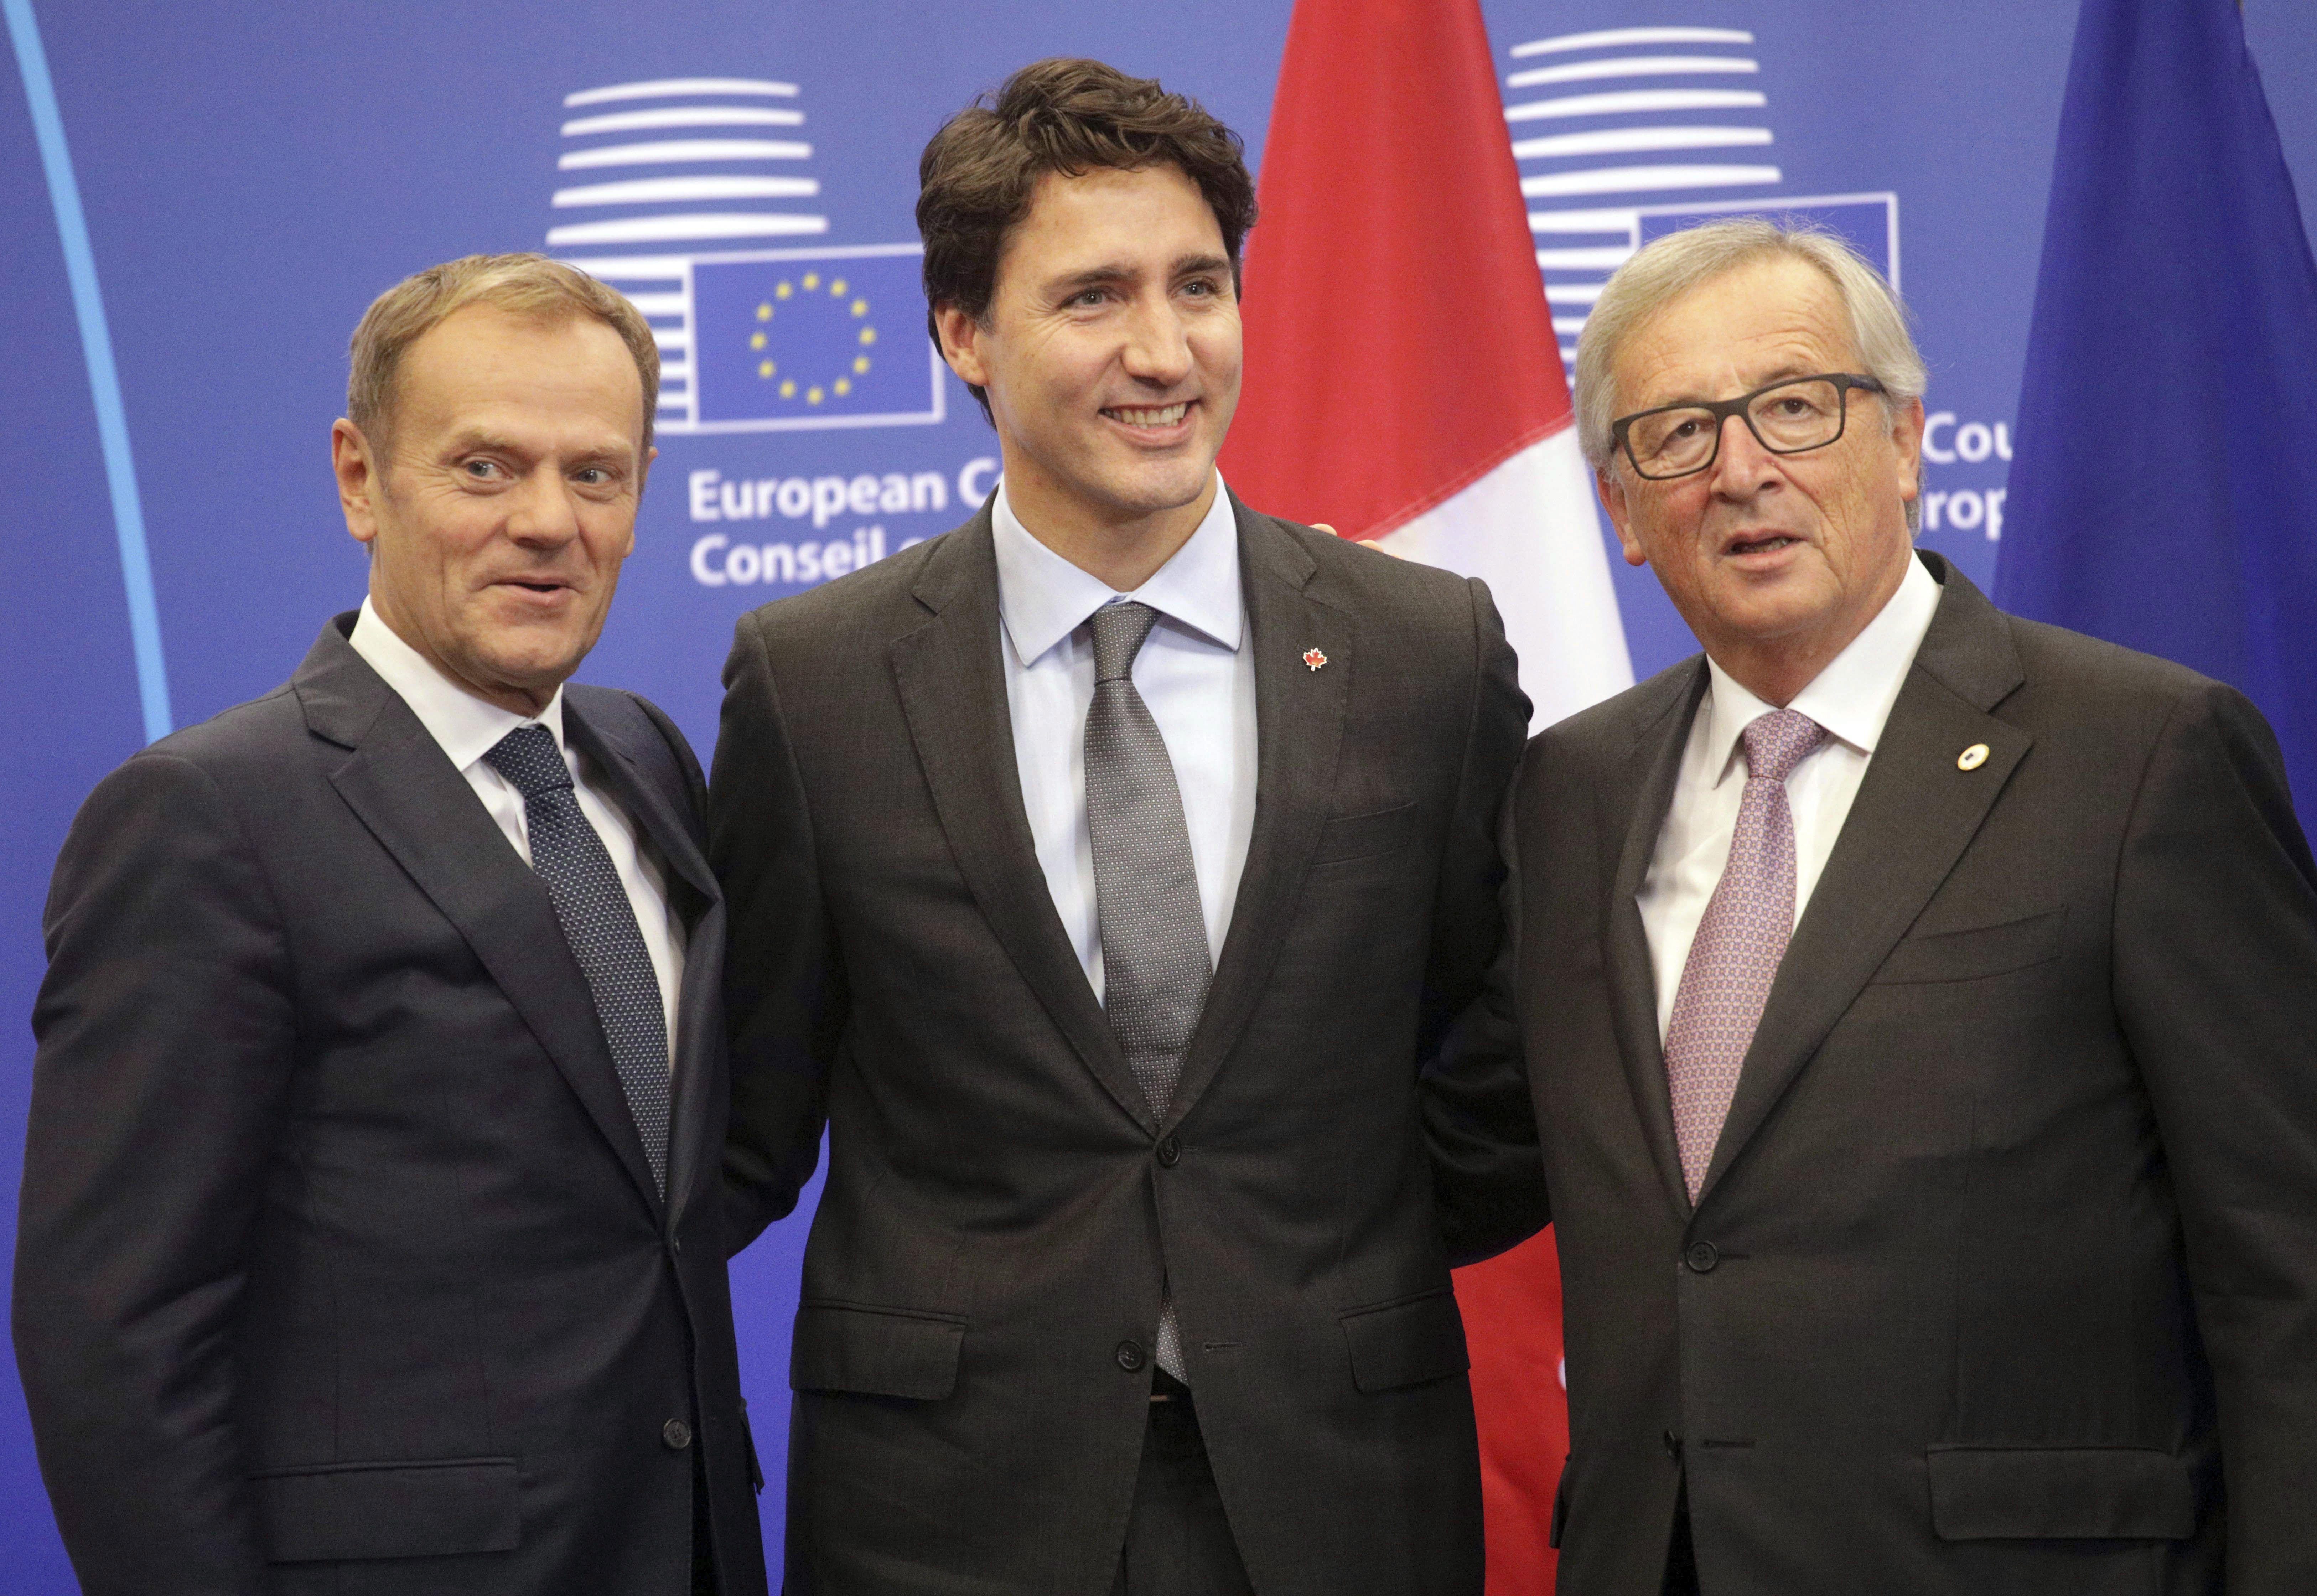 Brexit Trade Deals Could Change the British Landscape